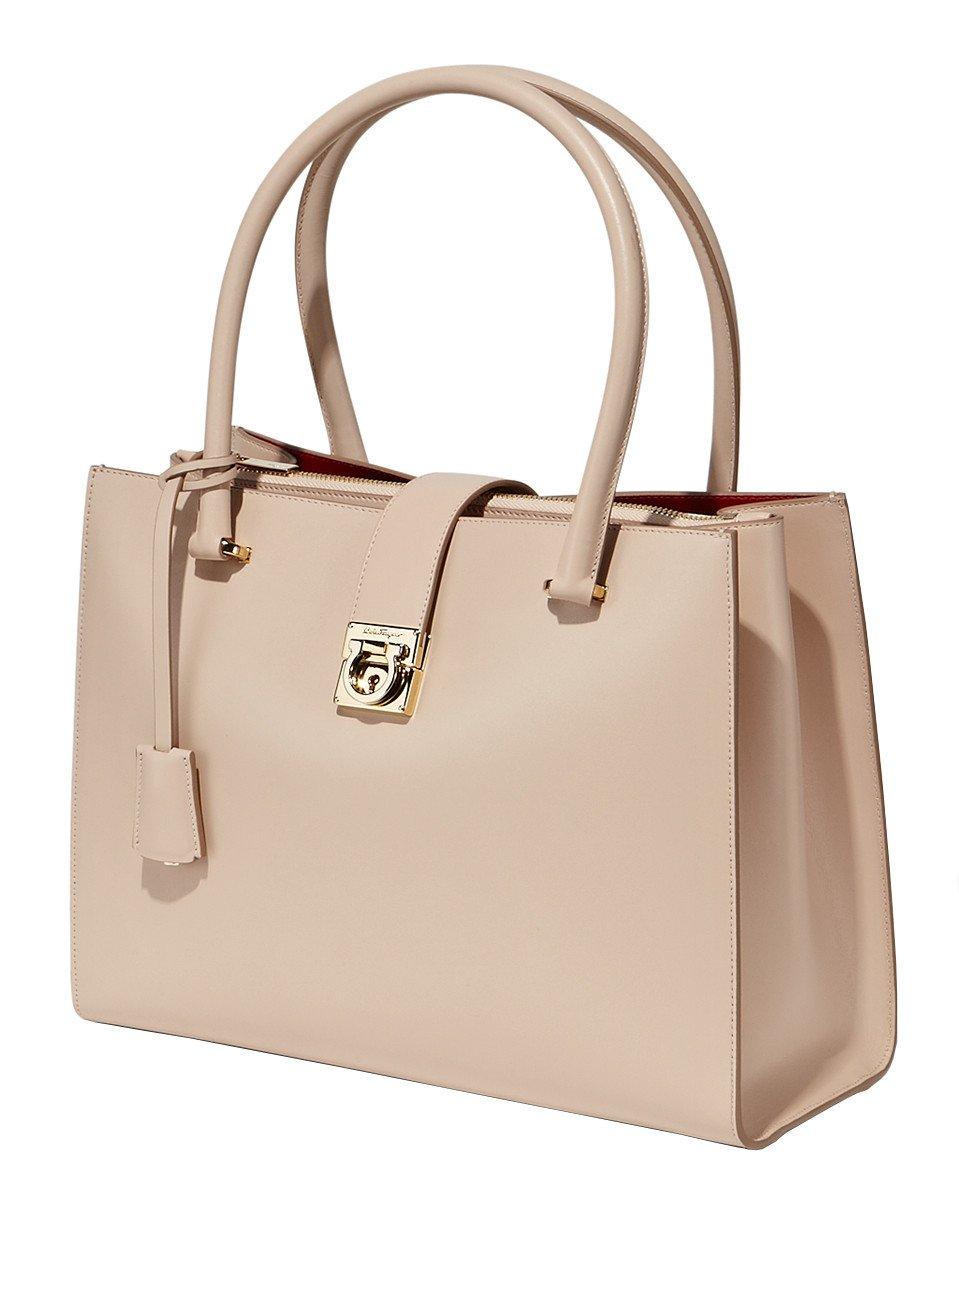 ferragamo marlene medium size leather tote bag in beige new bisque lyst. Black Bedroom Furniture Sets. Home Design Ideas